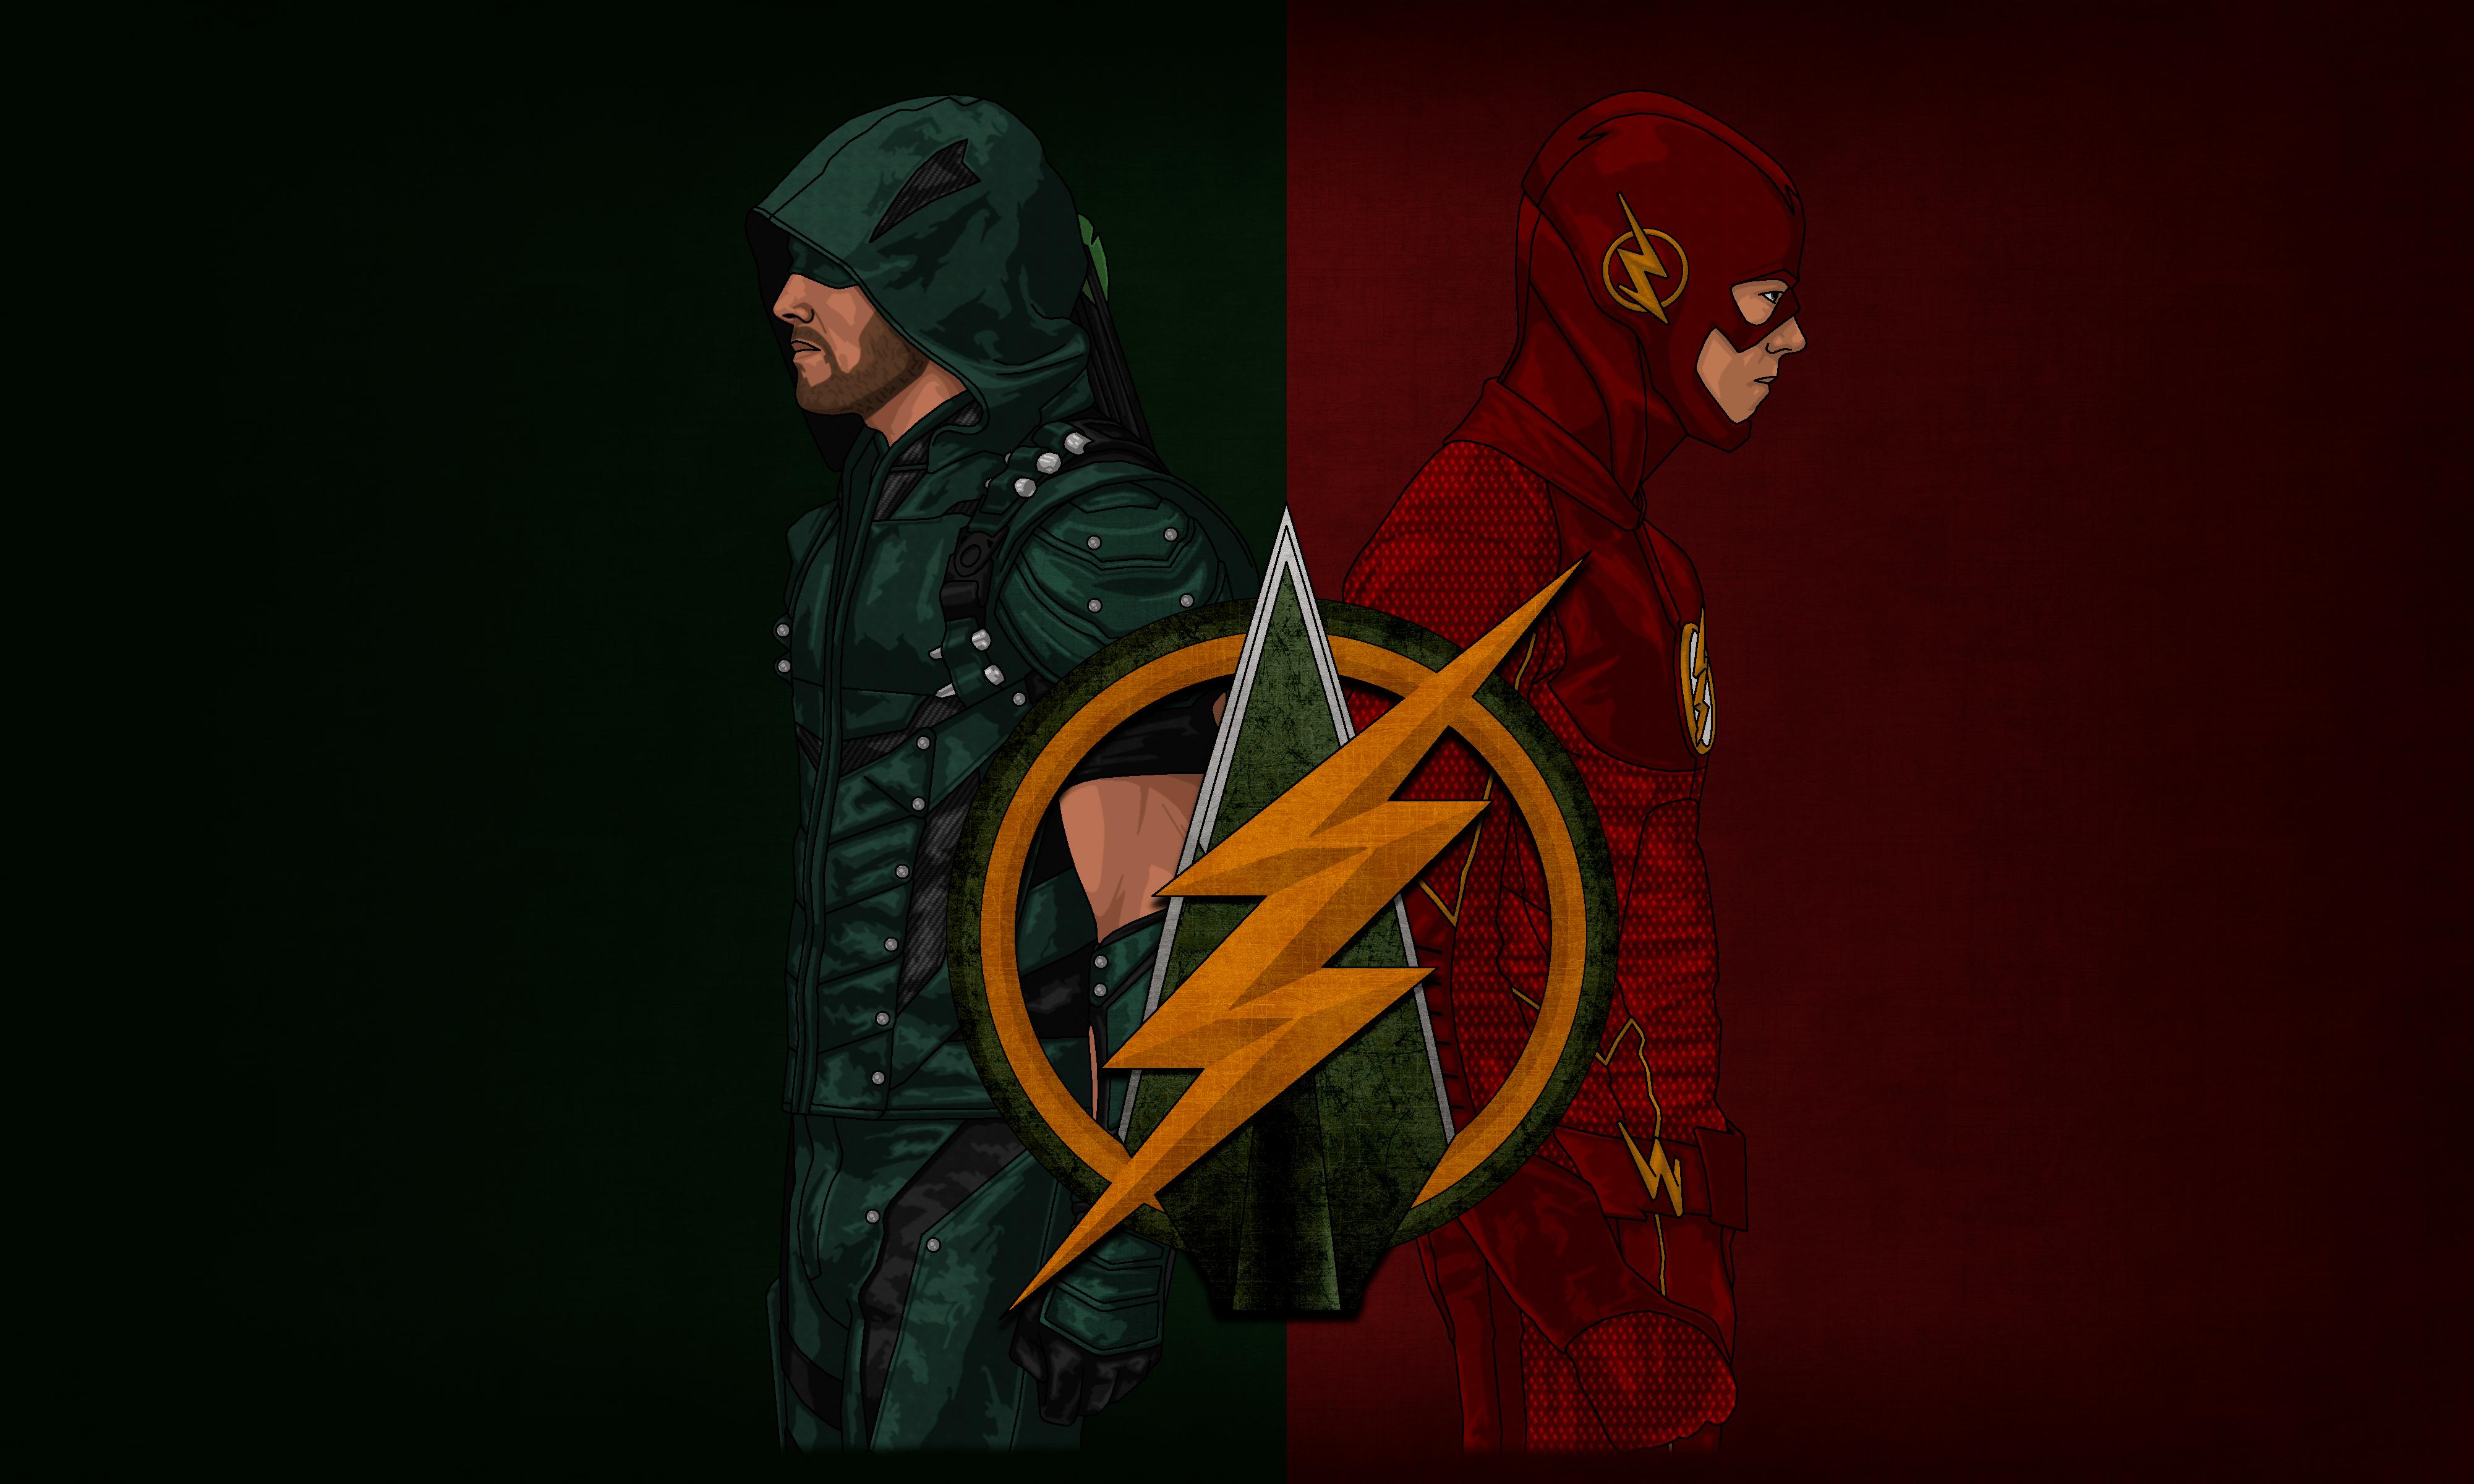 Green Arrow Wallpapers - Top Free Green Arrow Backgrounds ...